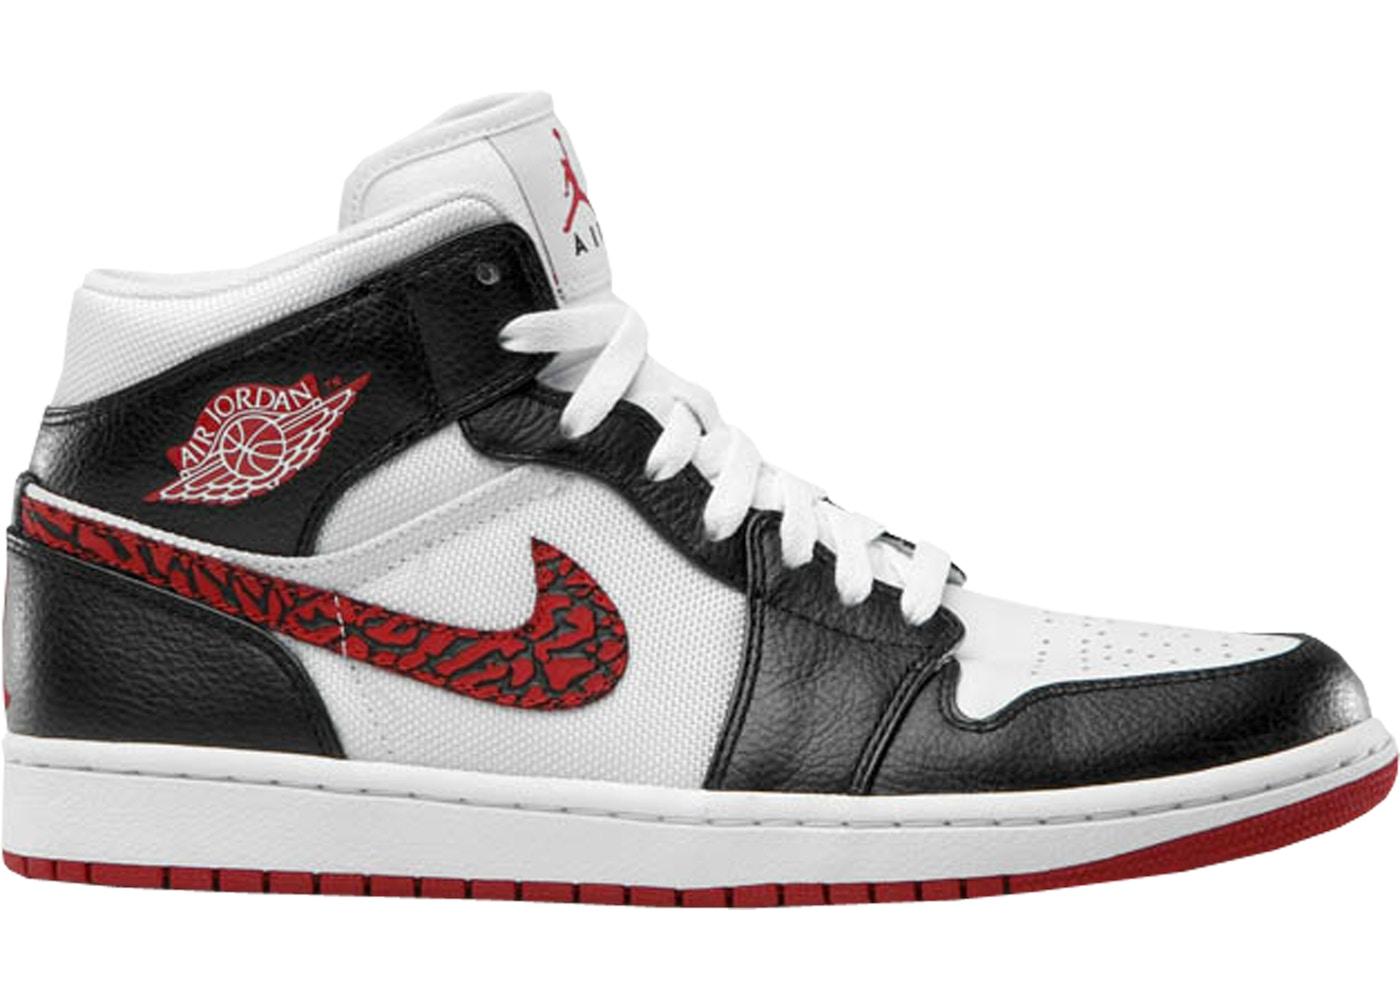 143ed1228b3 Jordan 1 Phat White Red Black (Elephant Print) - 364770-110